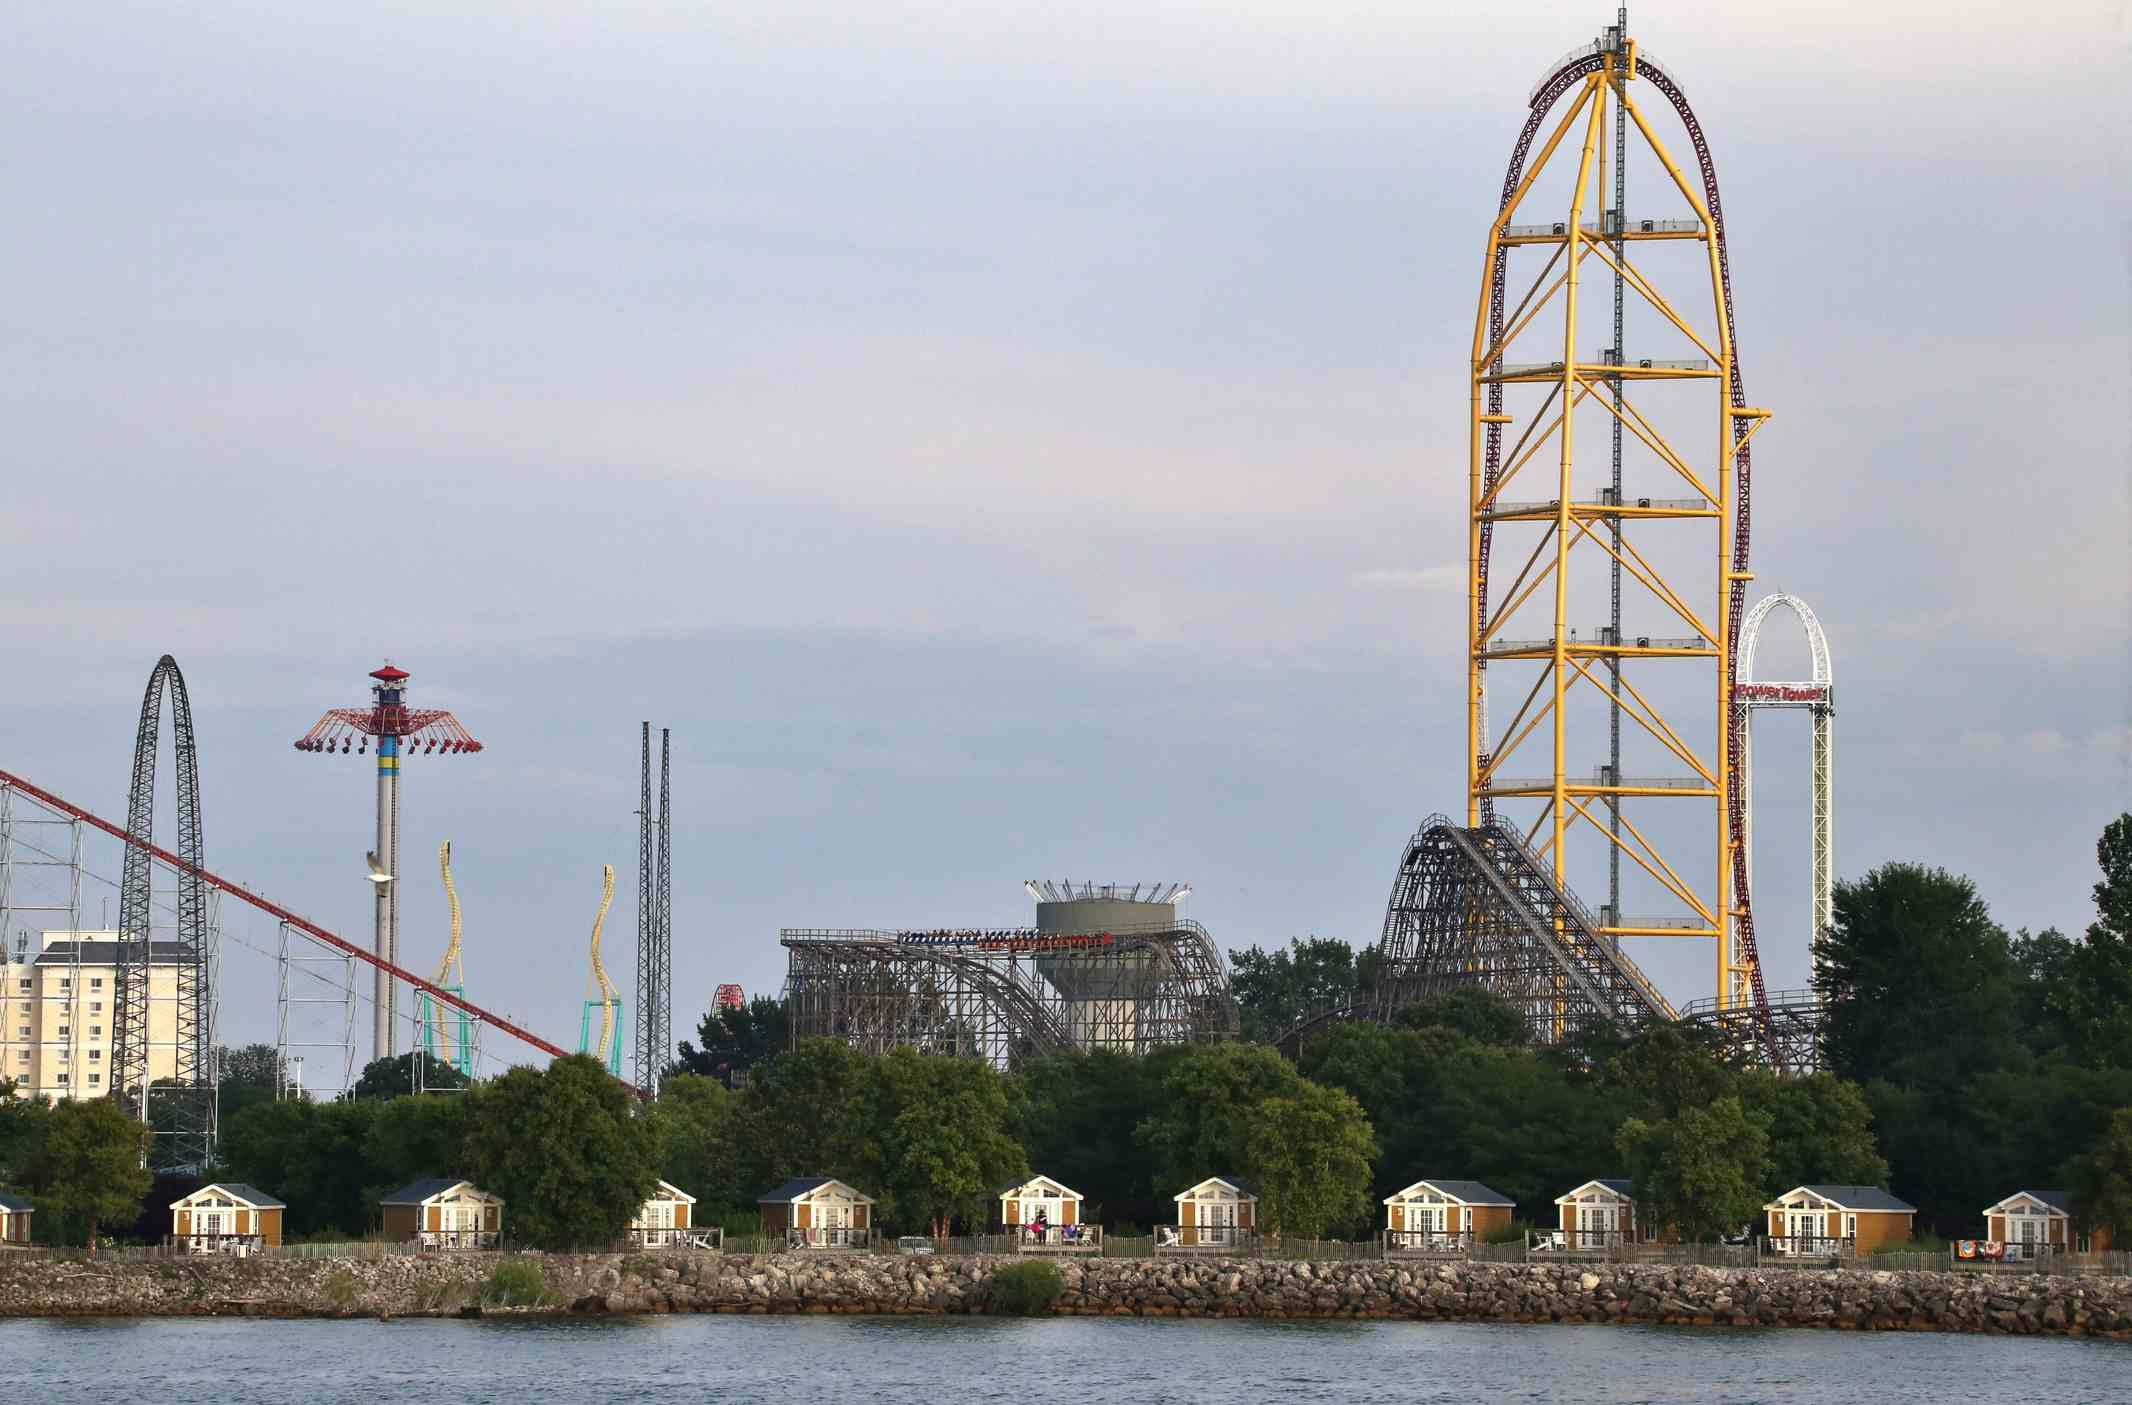 Cedar Point in Sandusky Ohio